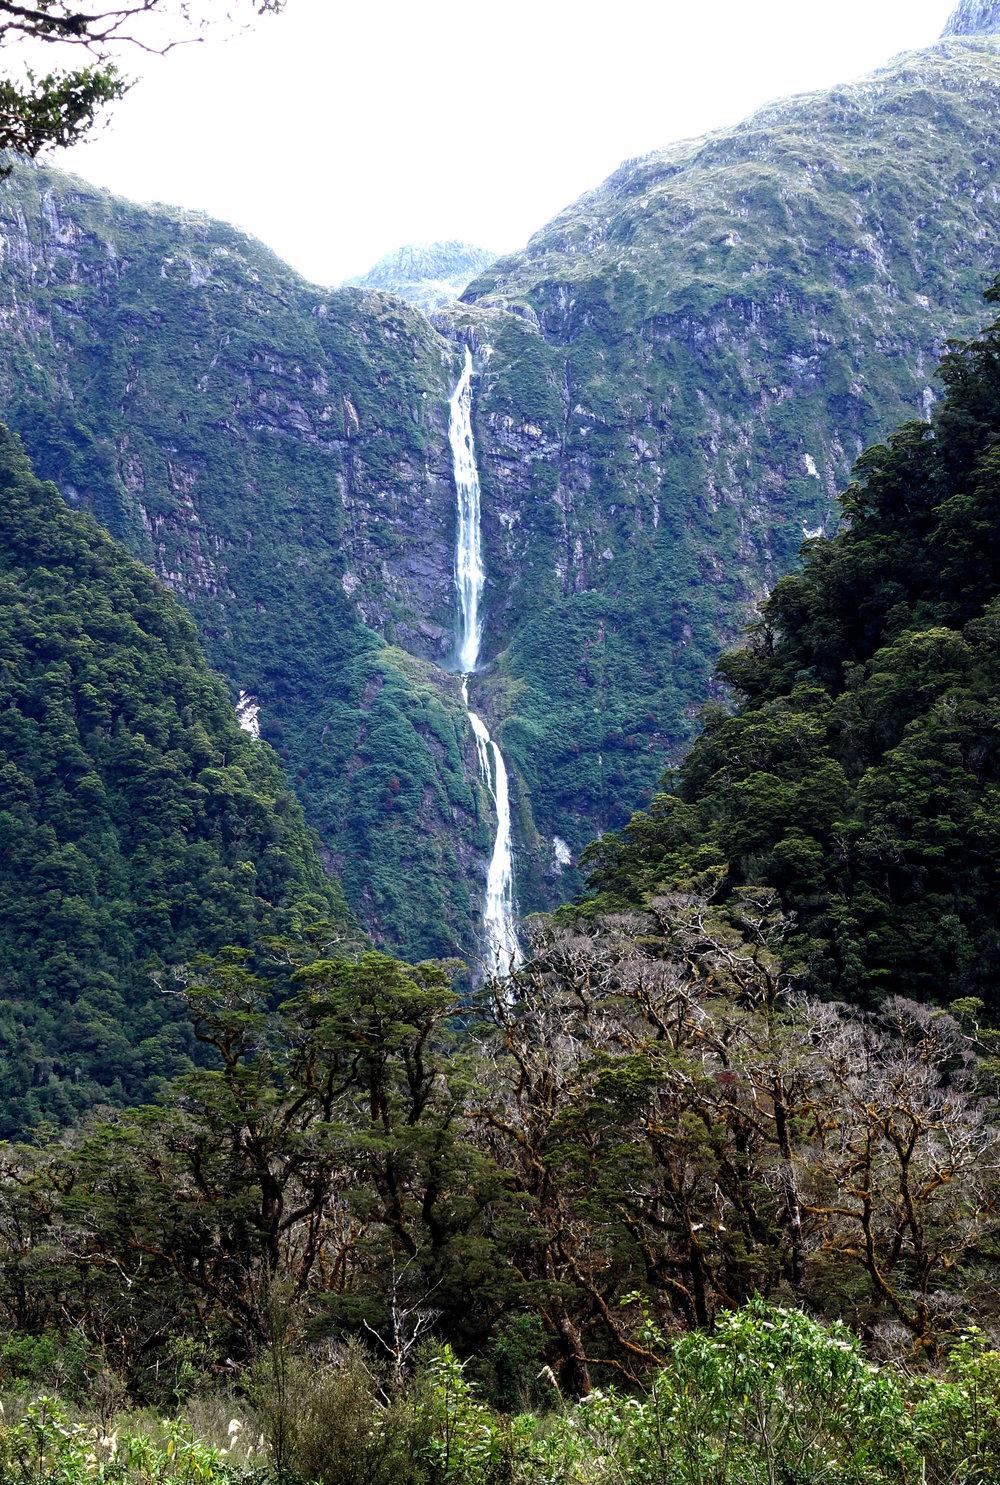 Sutherland falls from several kilometers away